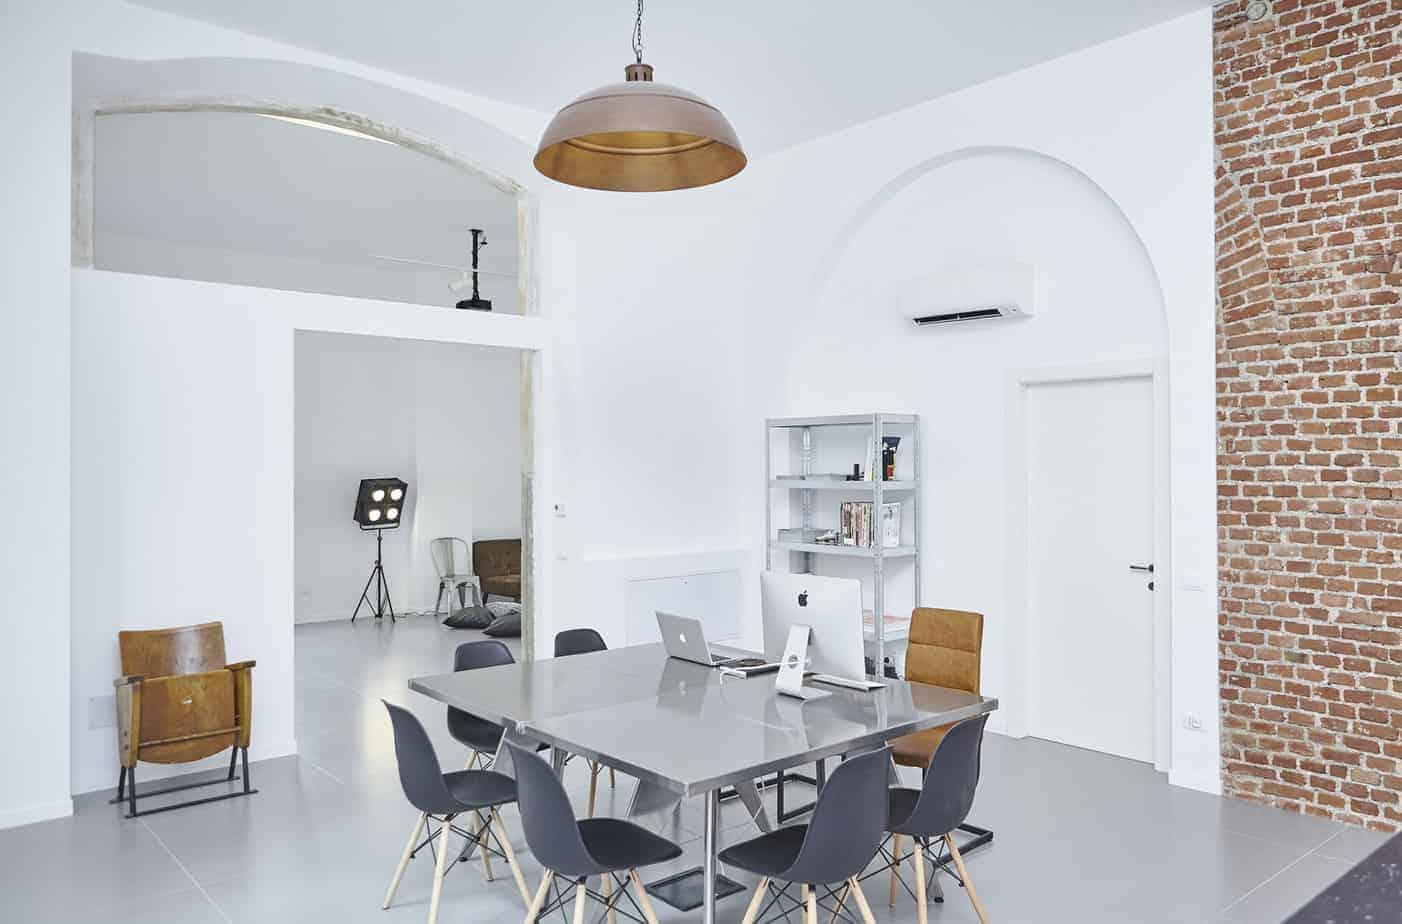 Minimalist and luminous meeting space with photo studio